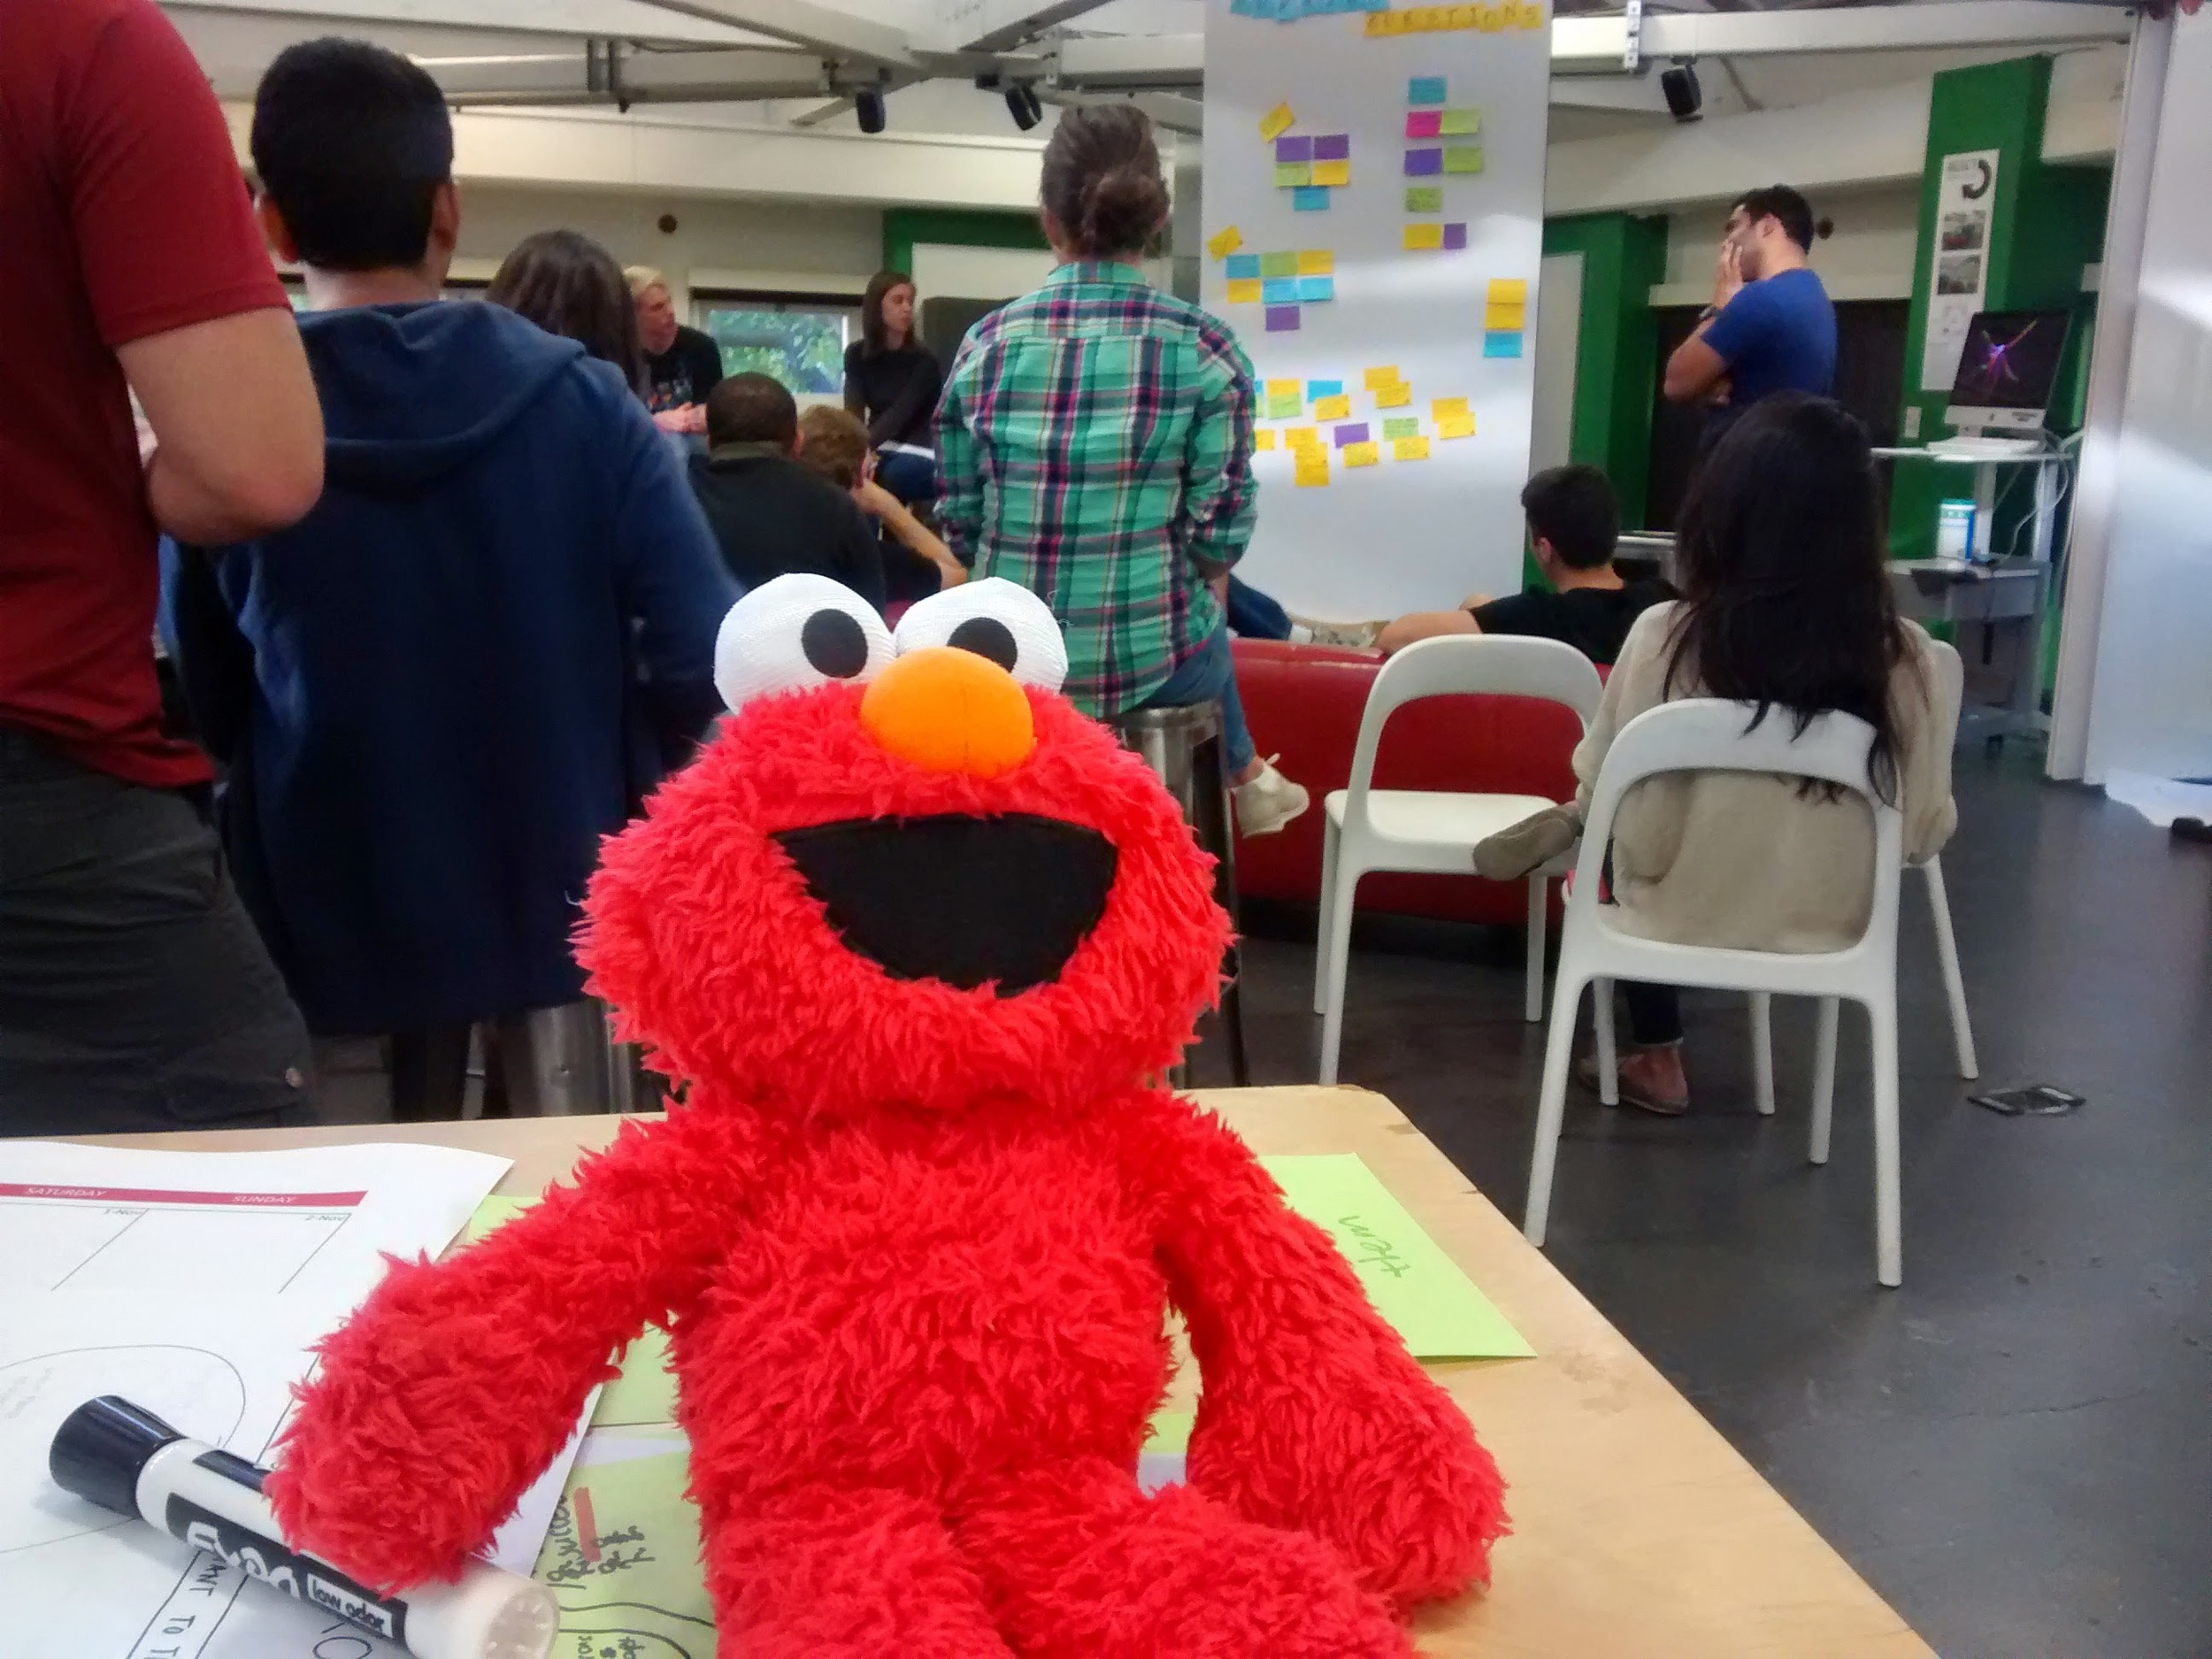 An Elmo plush toy makes an appearance during d.bootcamp. (Emi Kolawole)